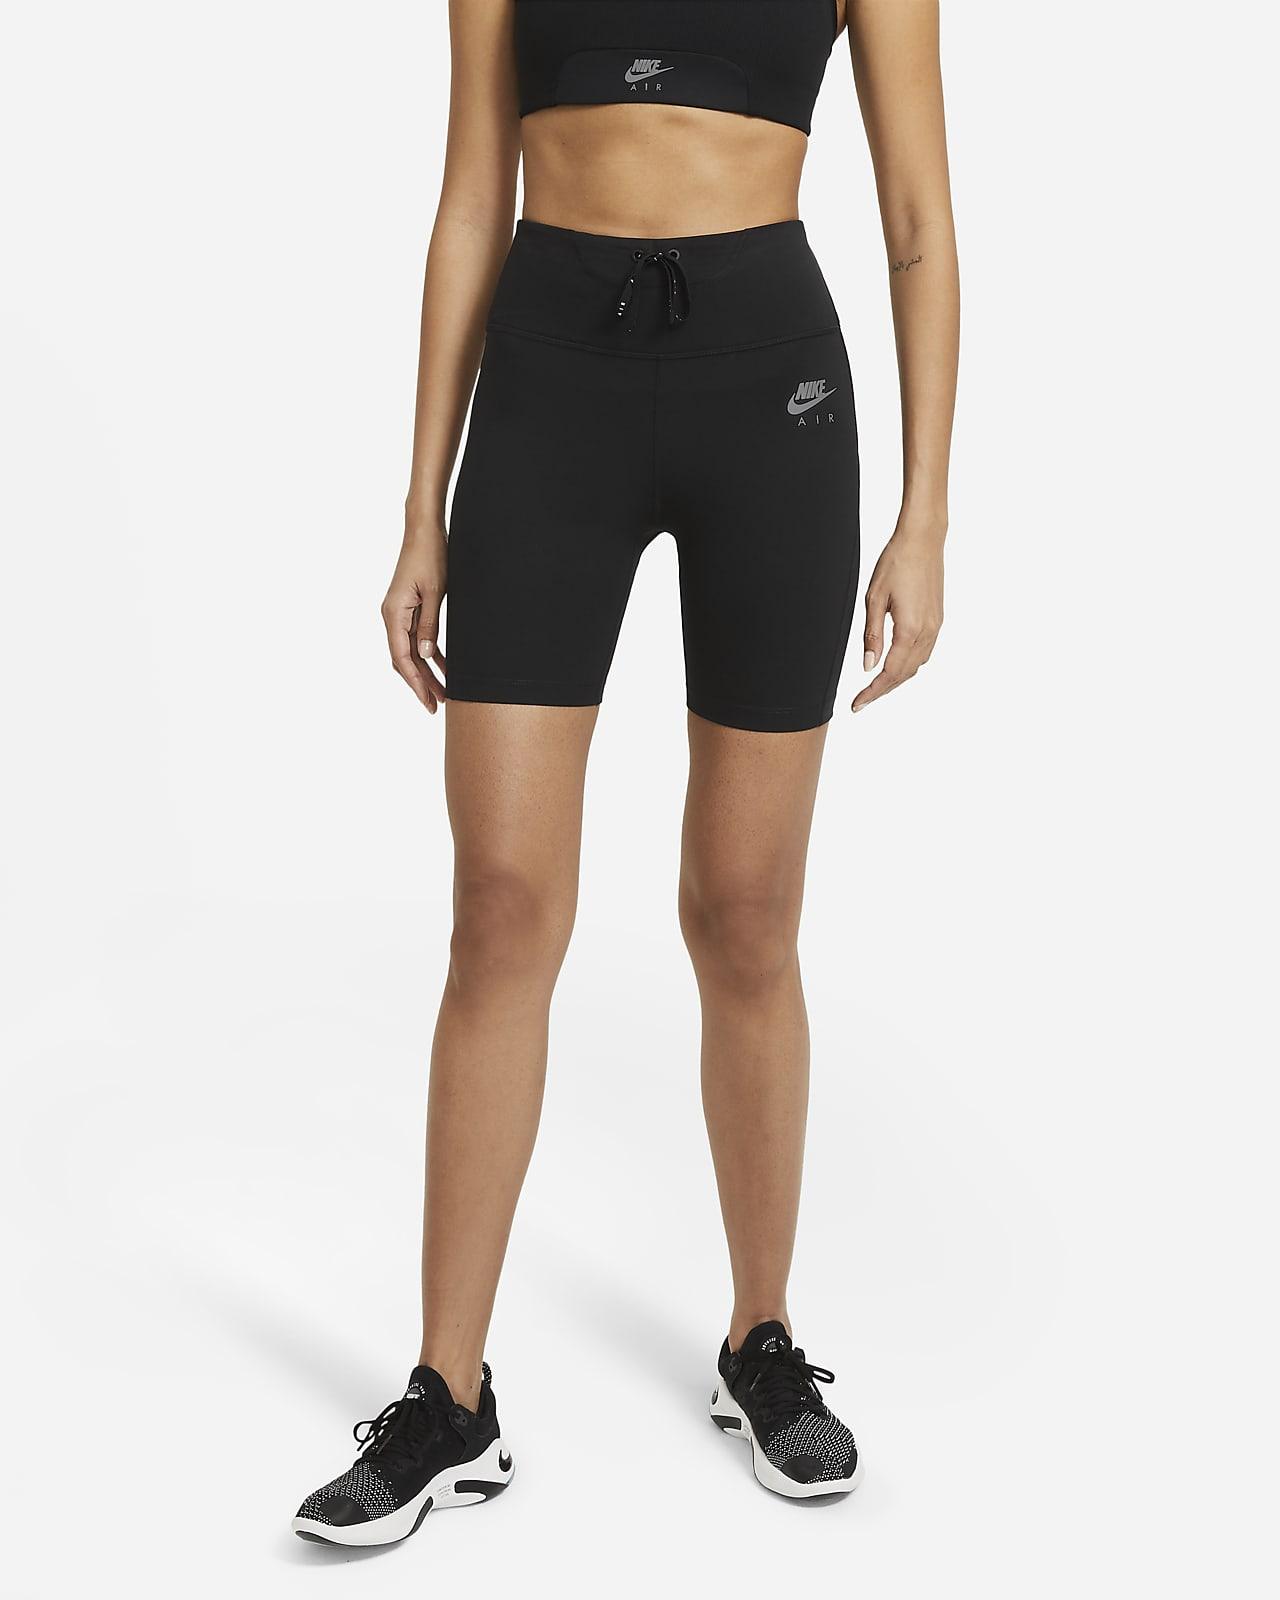 Shorts de running ajustados para mujer Nike Air